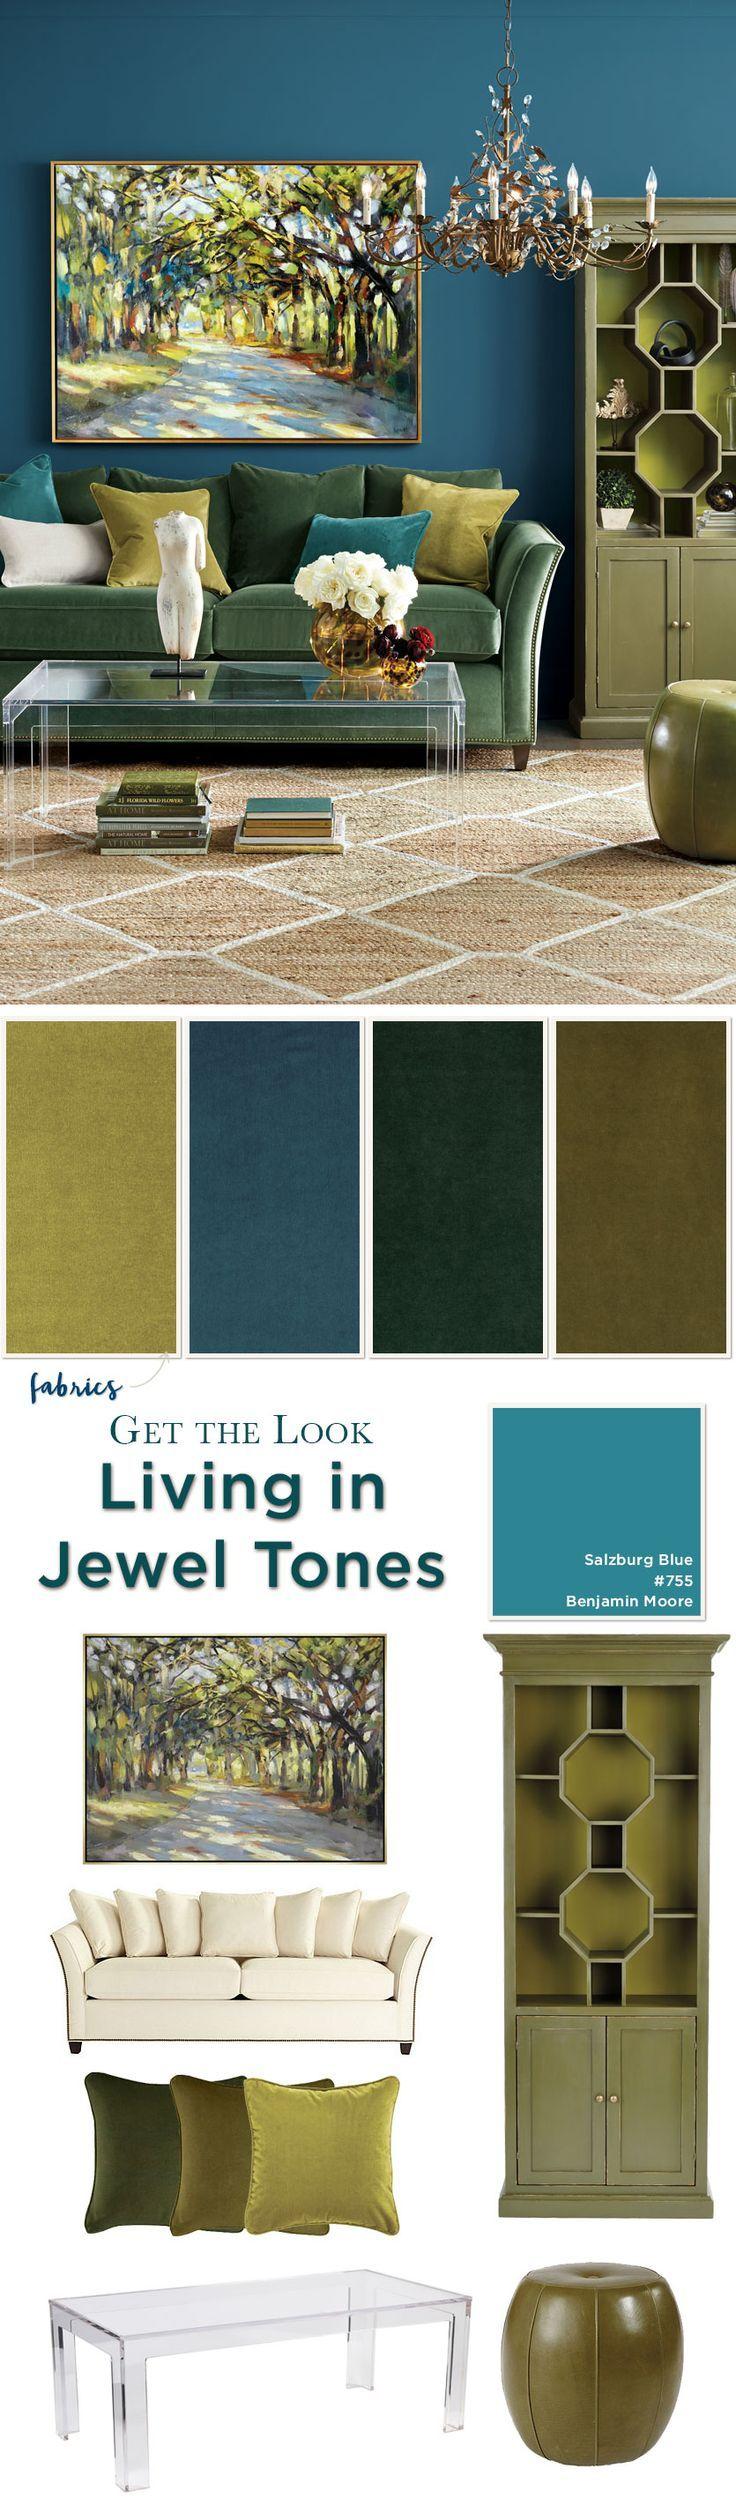 Jewel toned living room from Ballard Designs Fall 2016 catalog #livingroompaintcolorideas